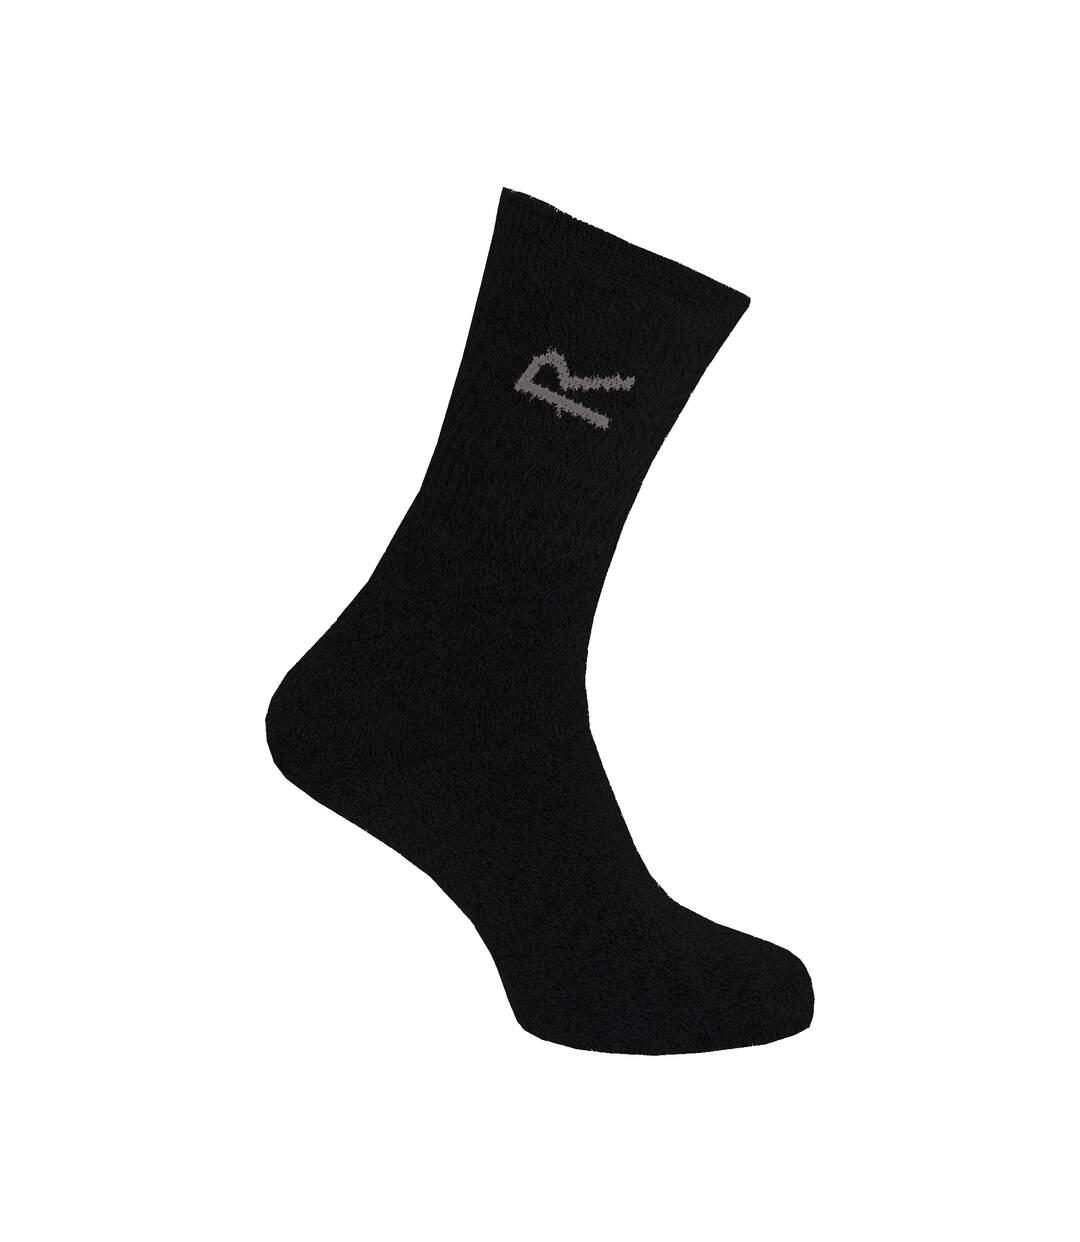 Regatta Great Outdoors Mens Cotton Rich Casual Socks (Pack Of 3) (Grey Marl) - UTRG786